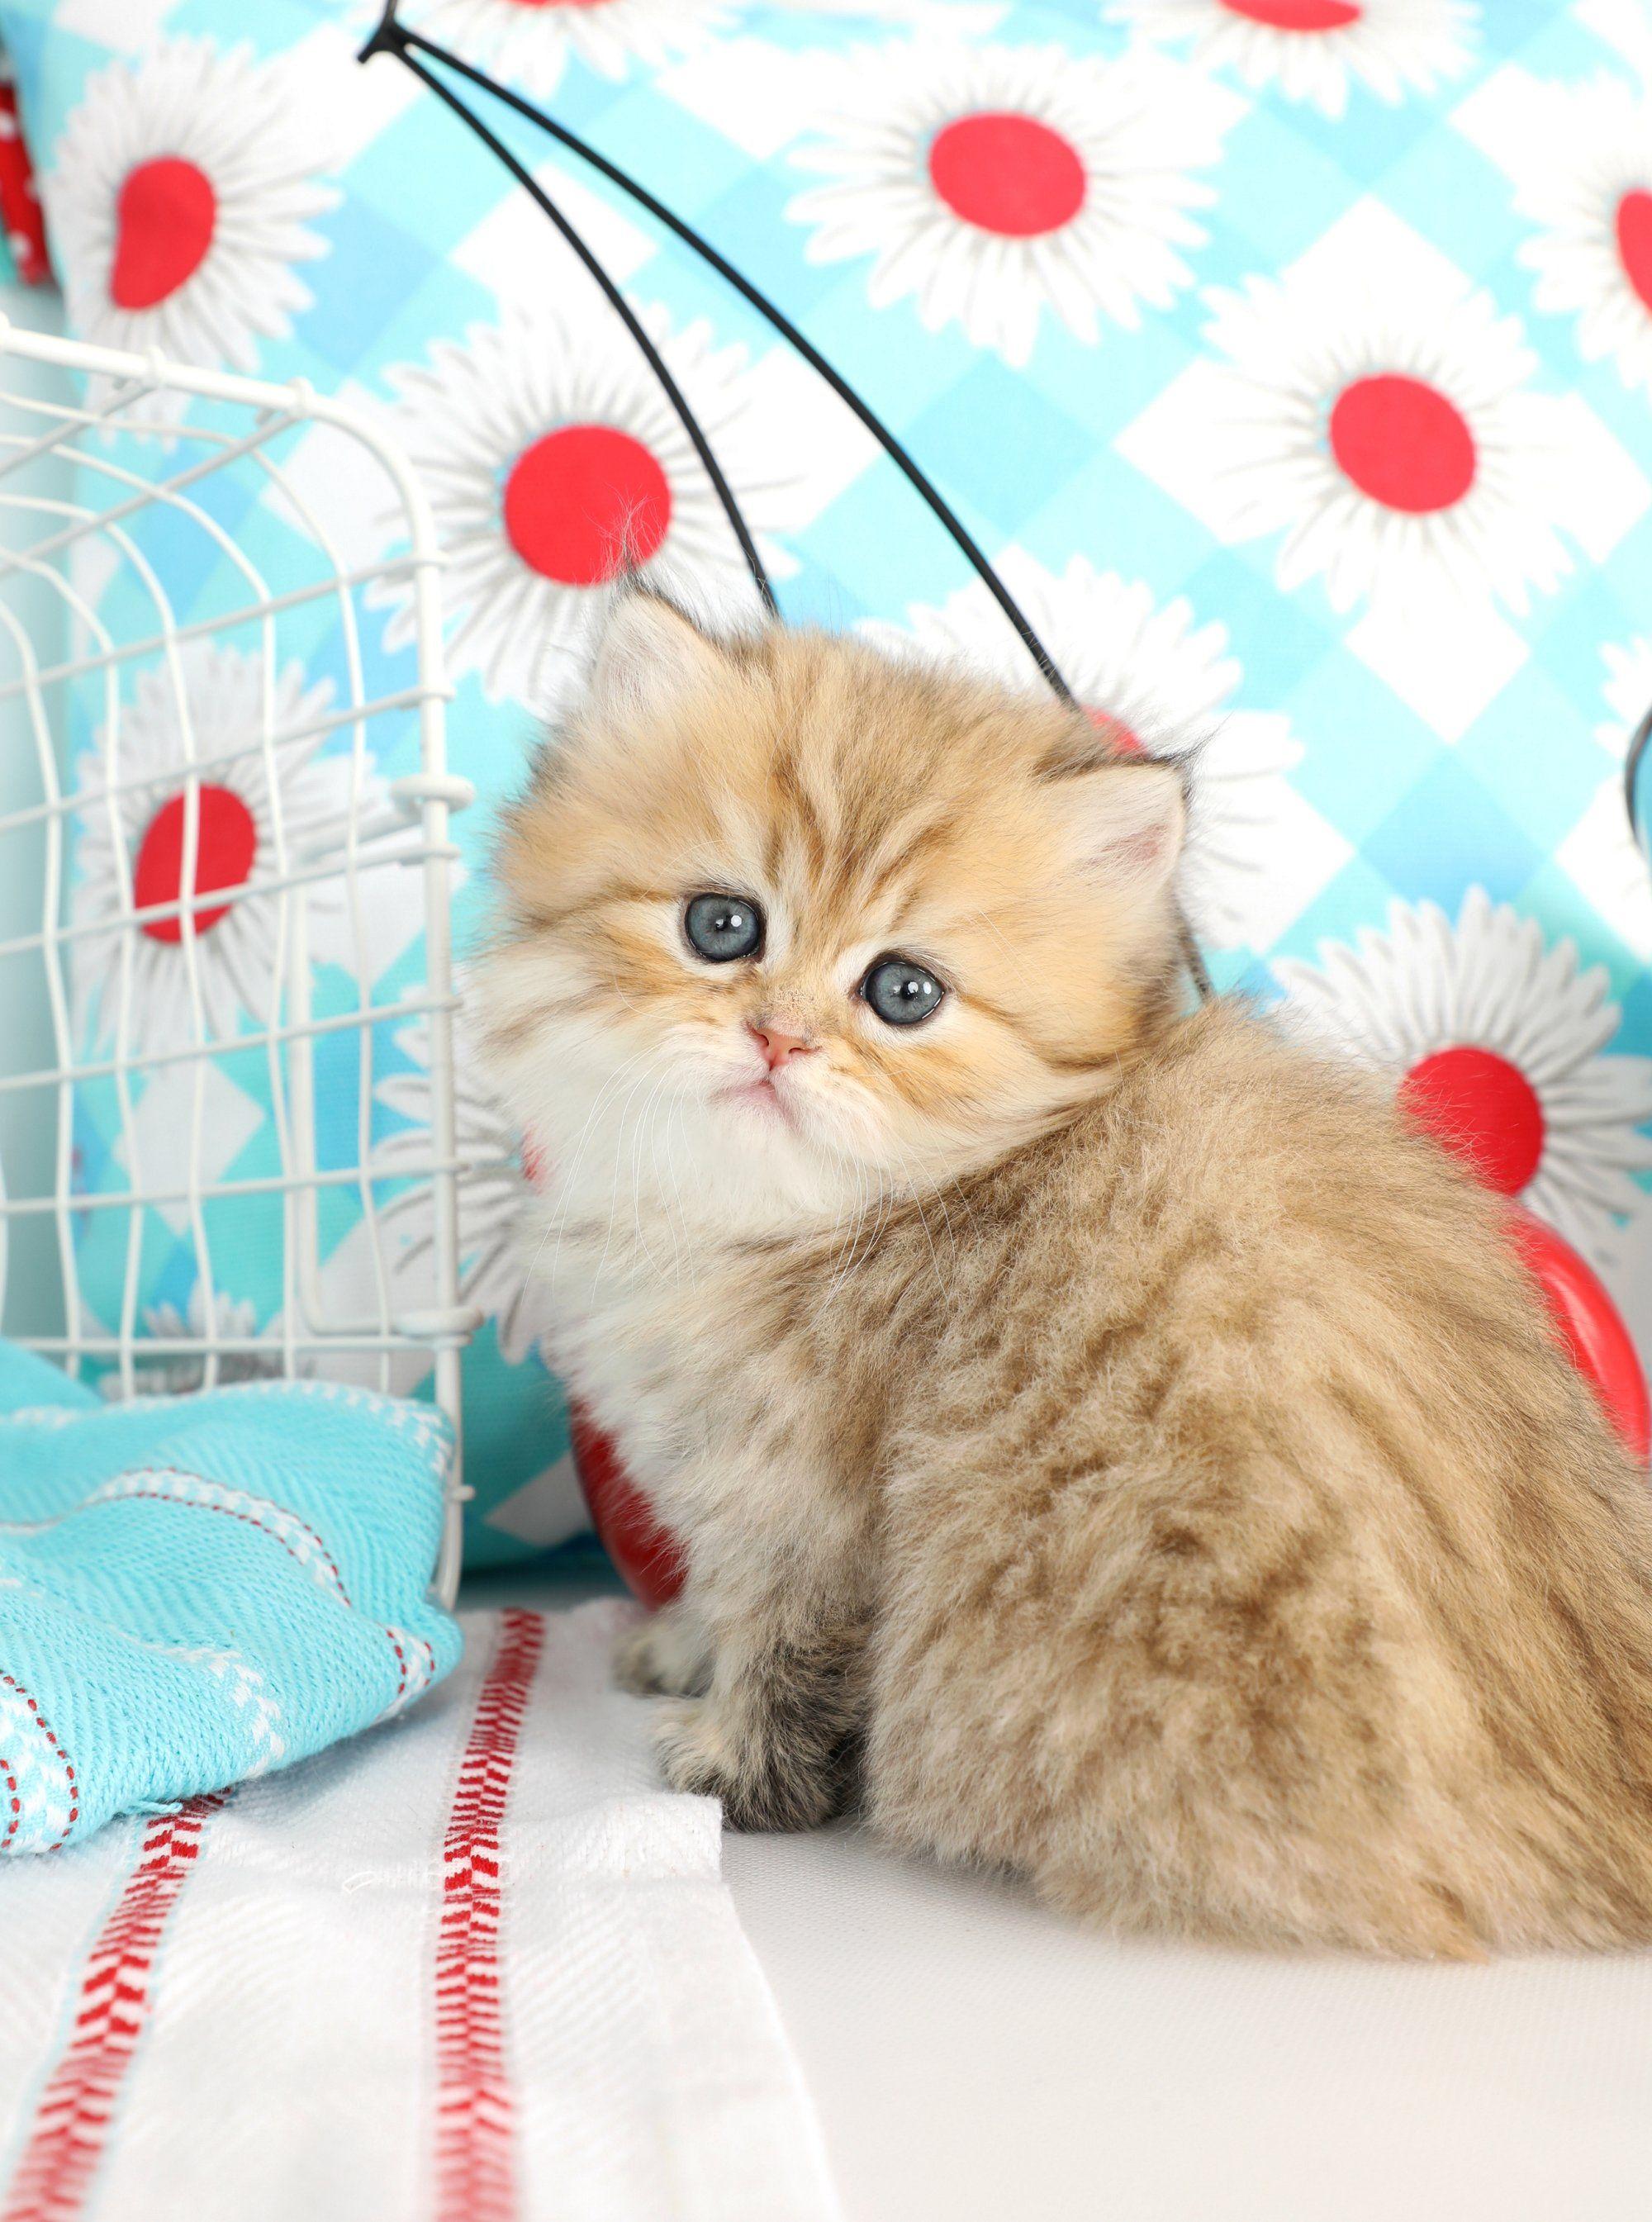 Glitterbug Golden Chinchilla Persian Kitten For Sale Persian Kittens For Sale Persian Kittens Persian Cat